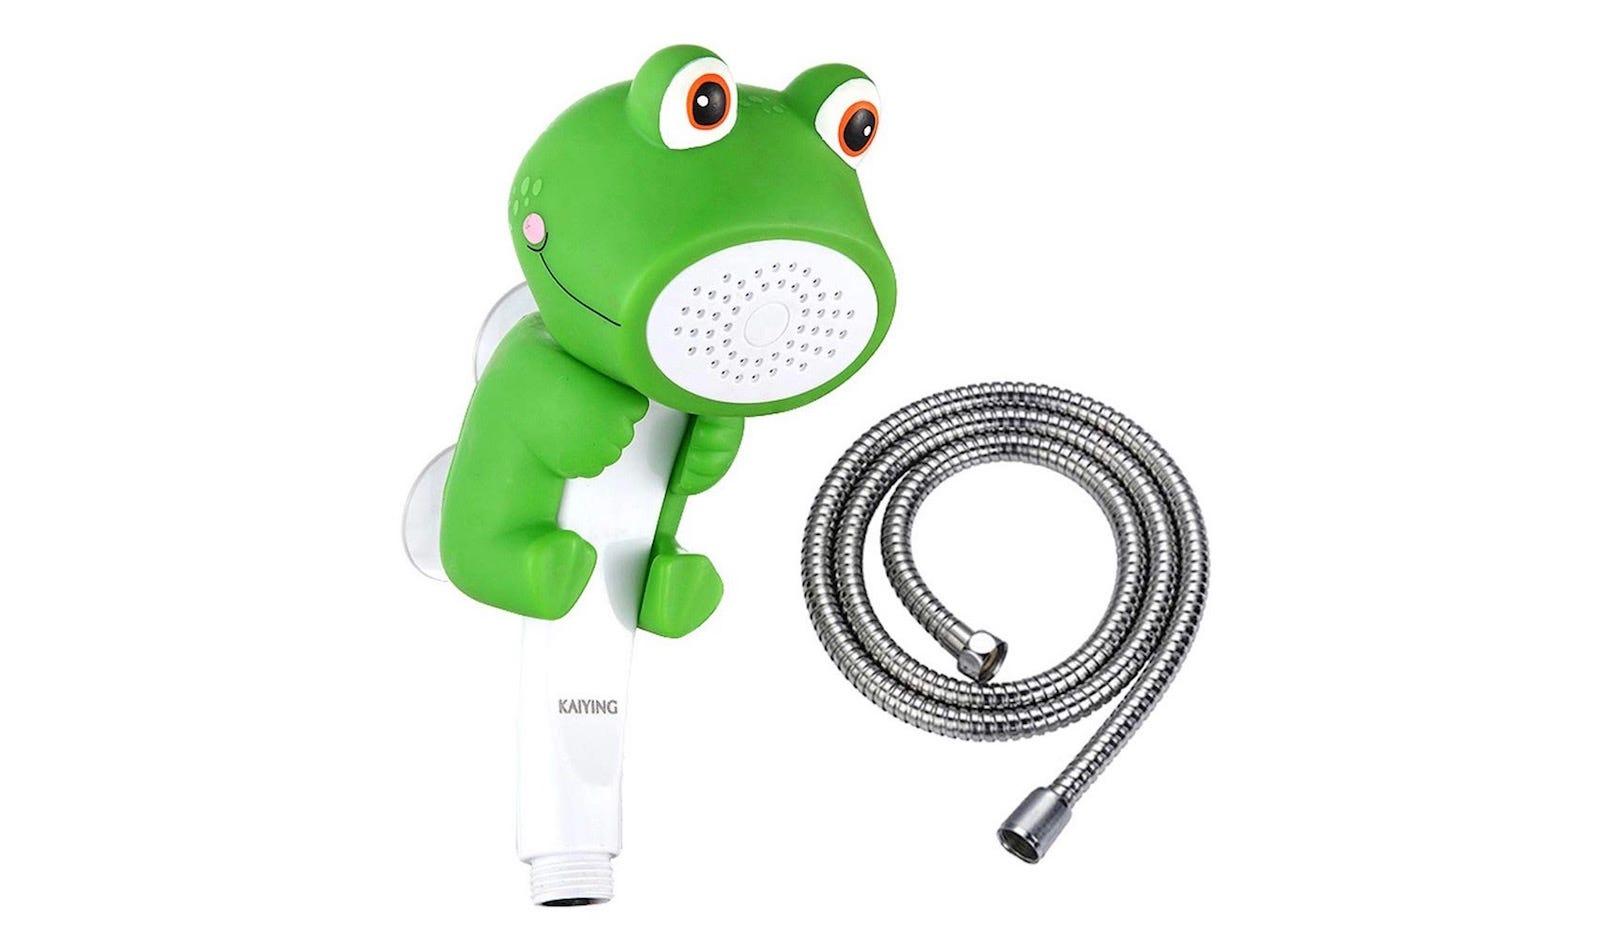 Kaiying Frog showerhead and hose.